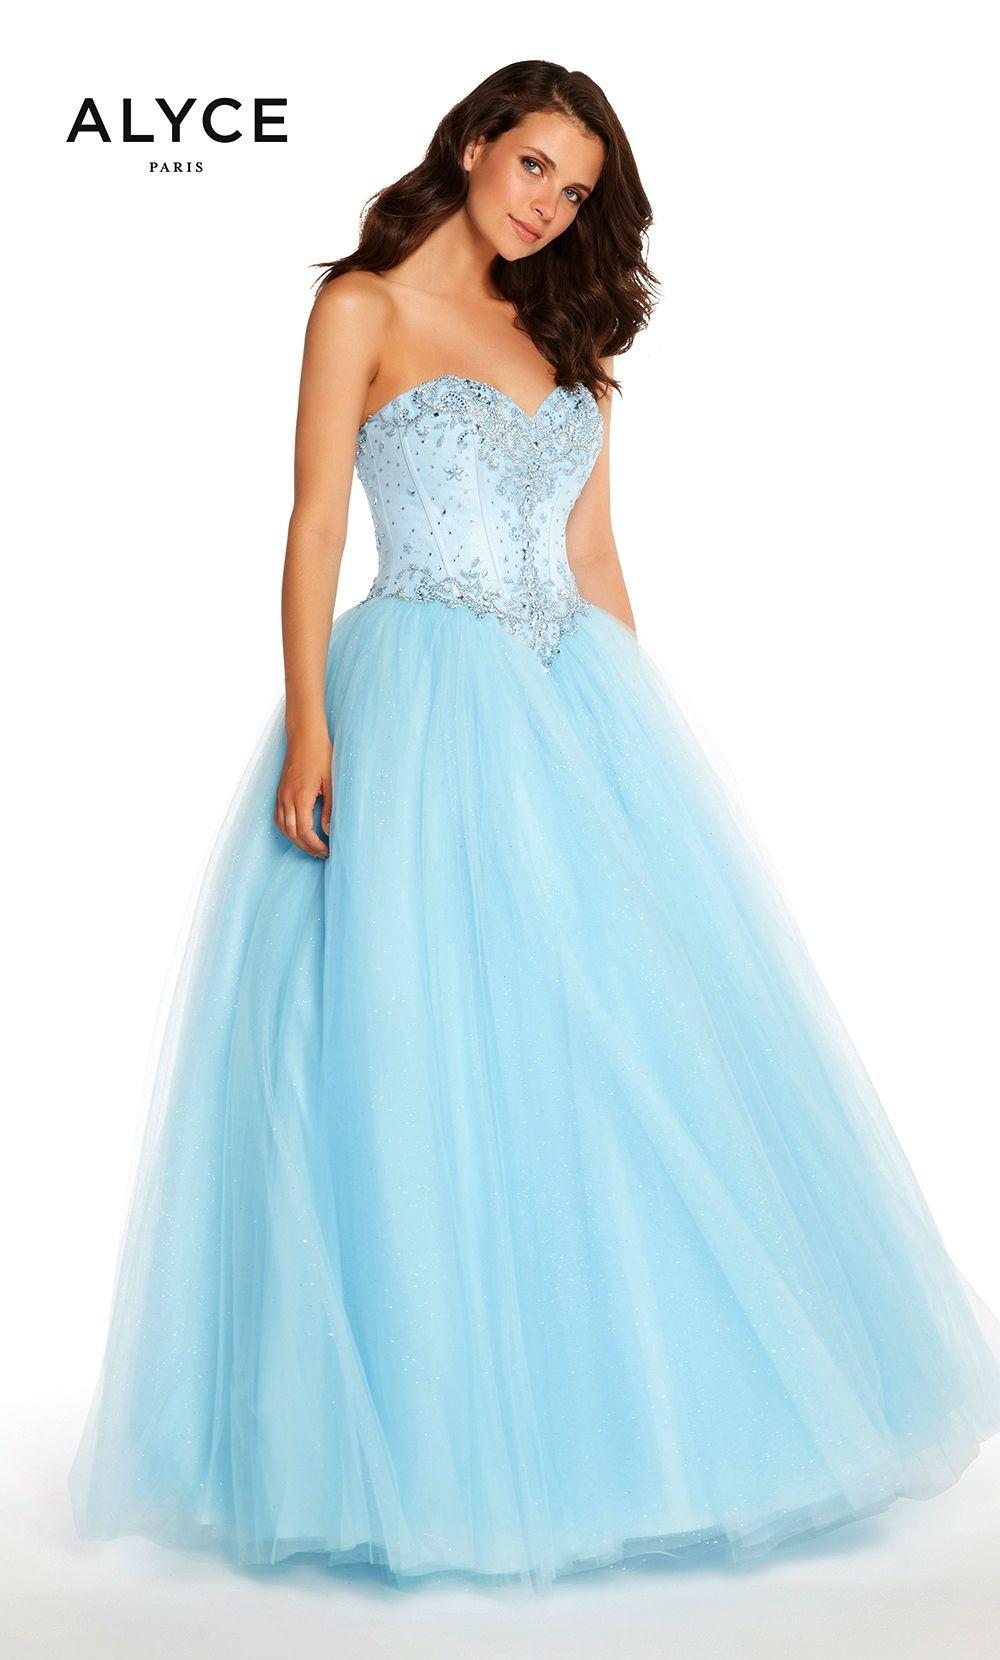 Prom dresses evening dresses by alyce parisucbrueaayucbruestrapless